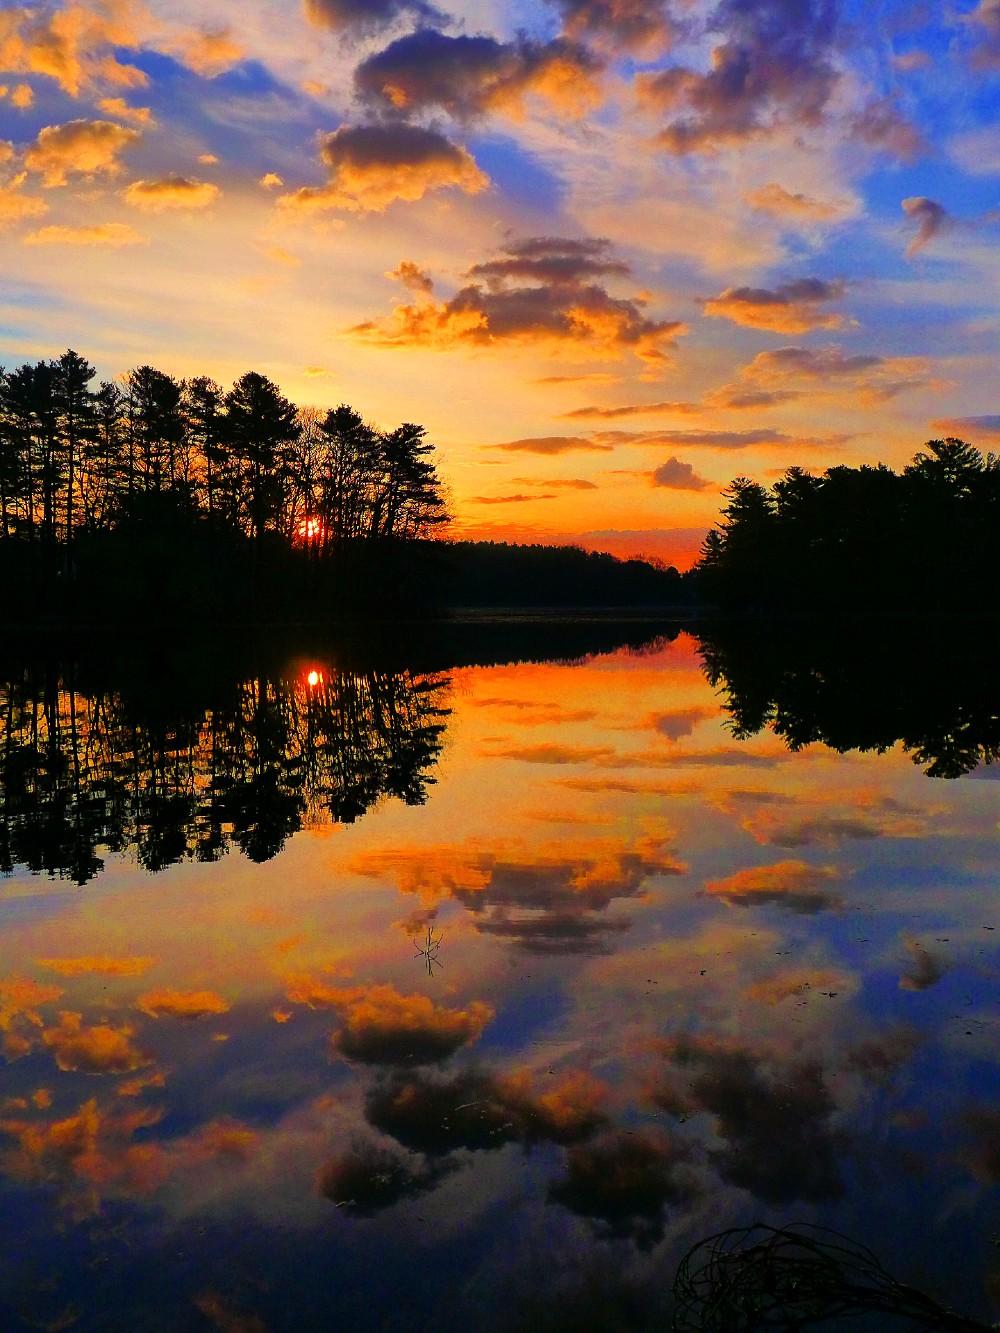 Sunrise at Turner Pond in Walpole, MA.